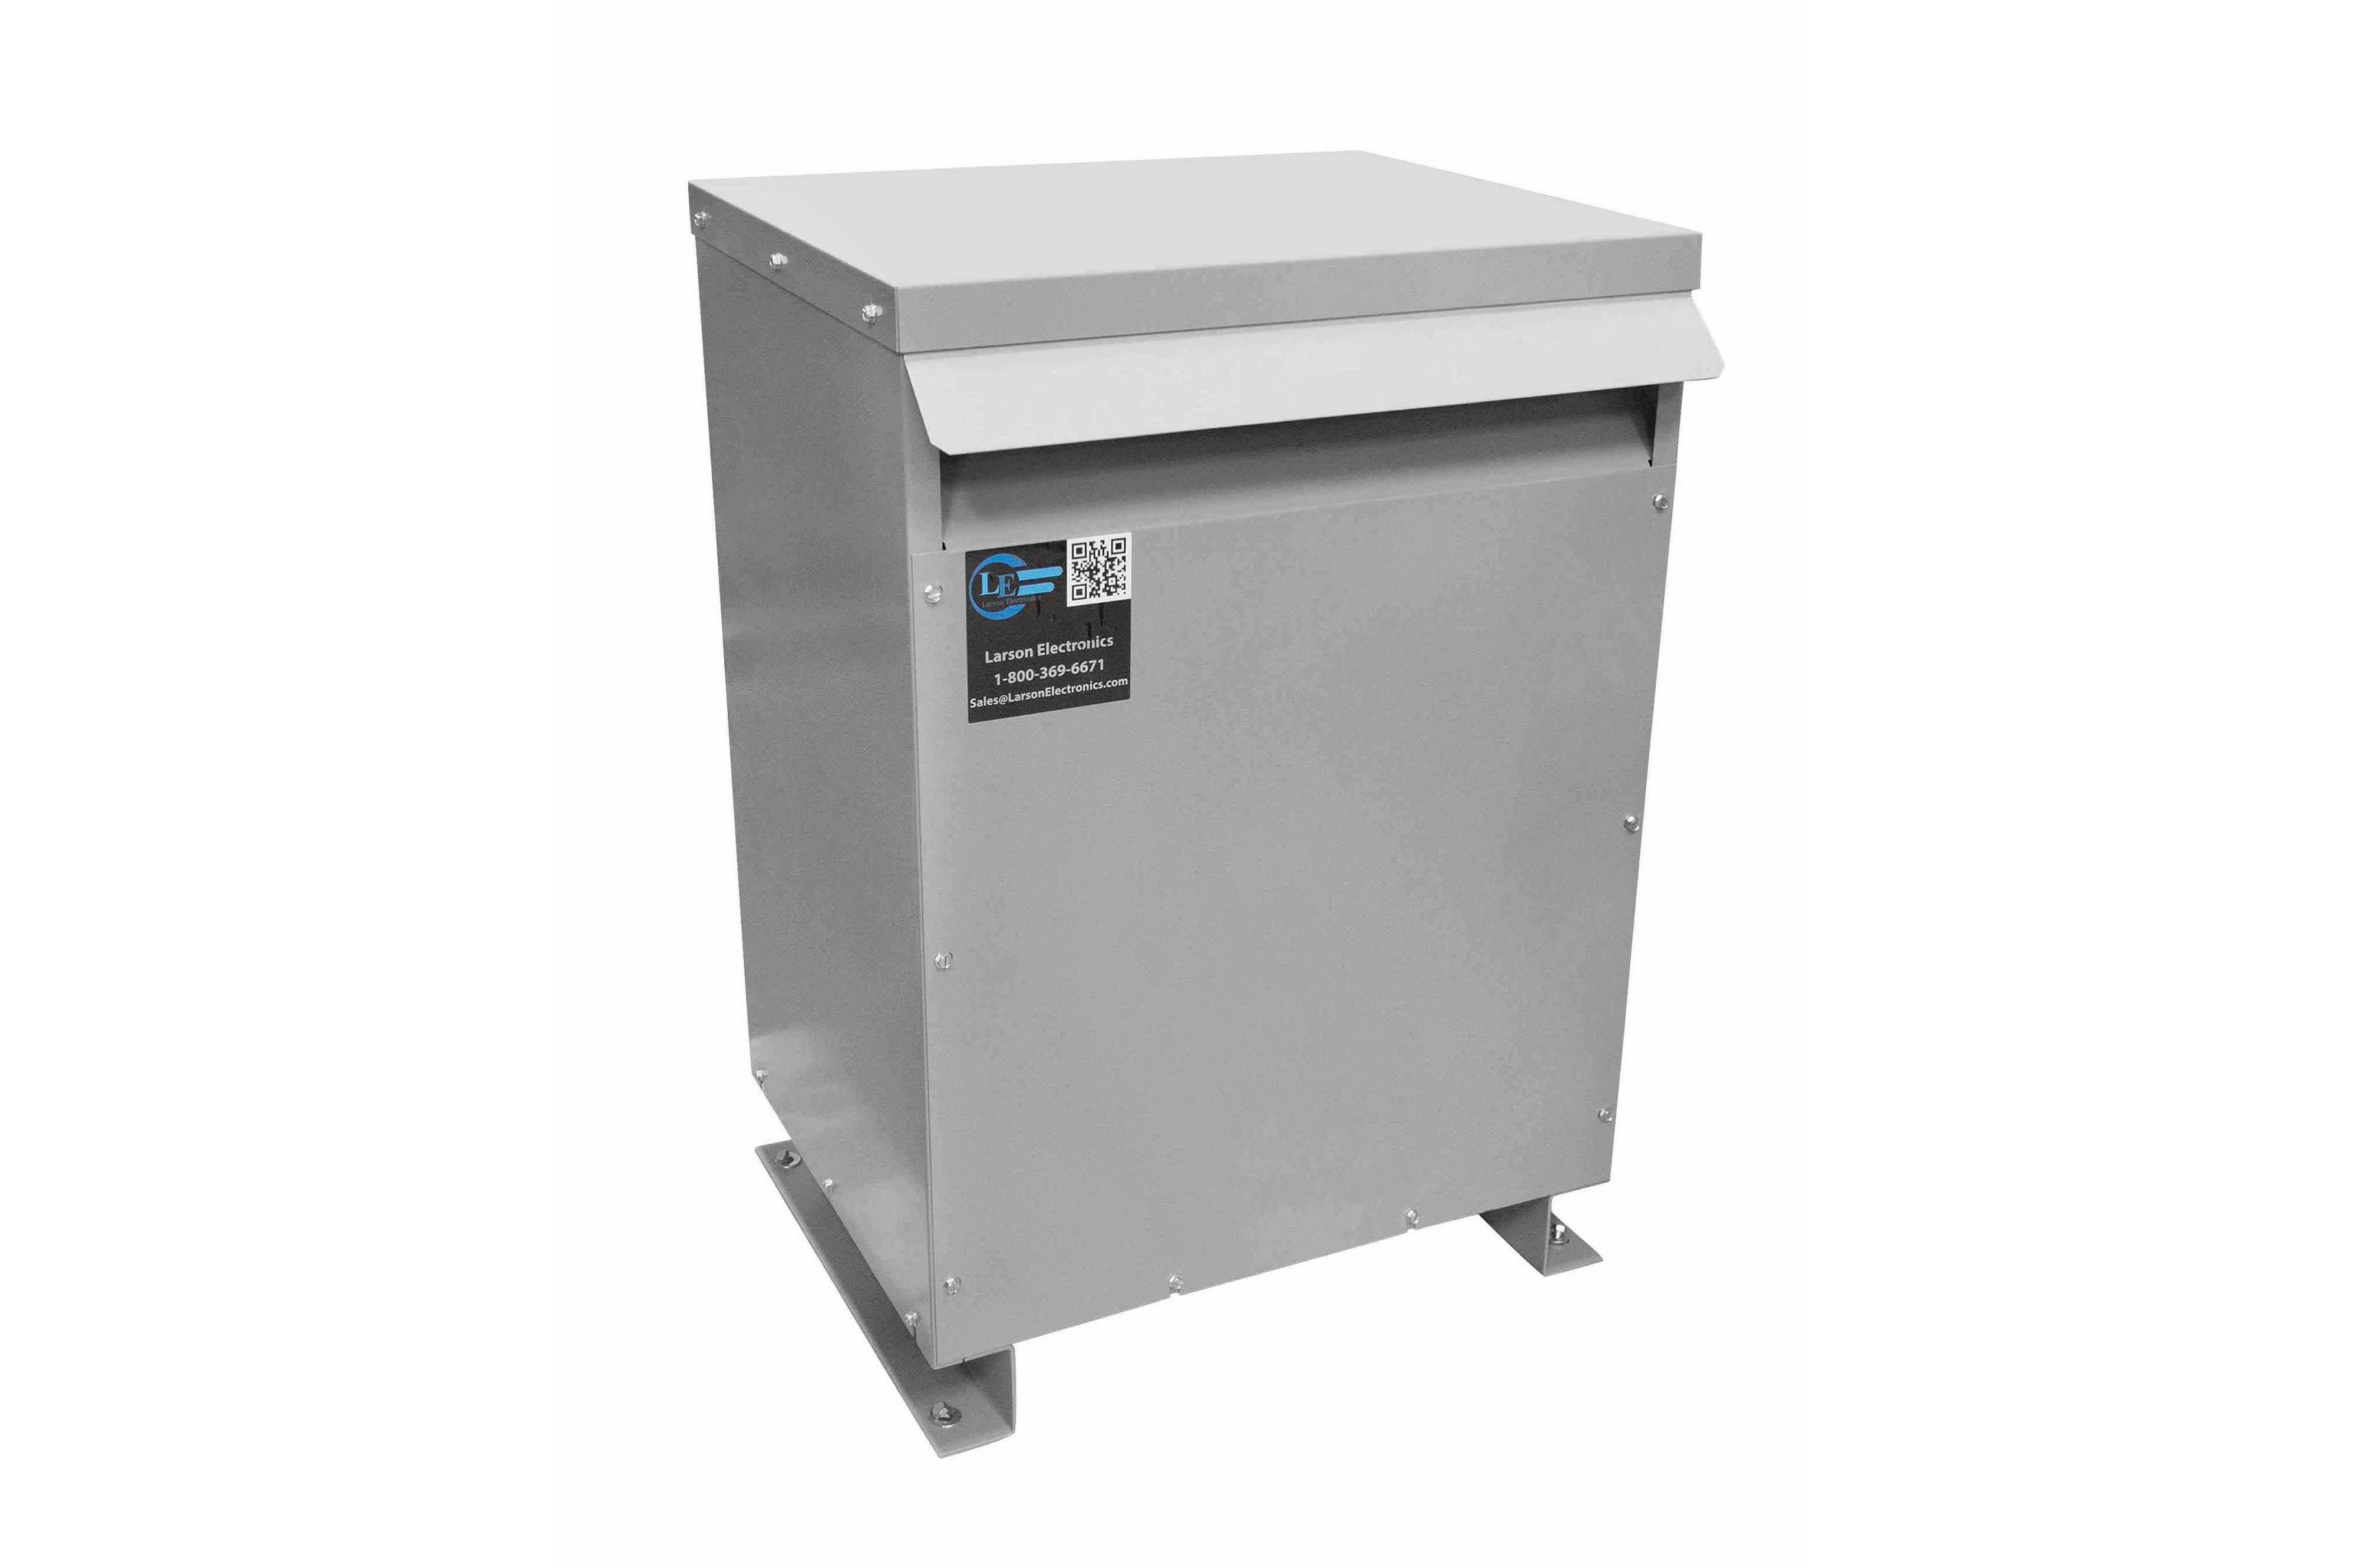 115 kVA 3PH Isolation Transformer, 220V Wye Primary, 480V Delta Secondary, N3R, Ventilated, 60 Hz